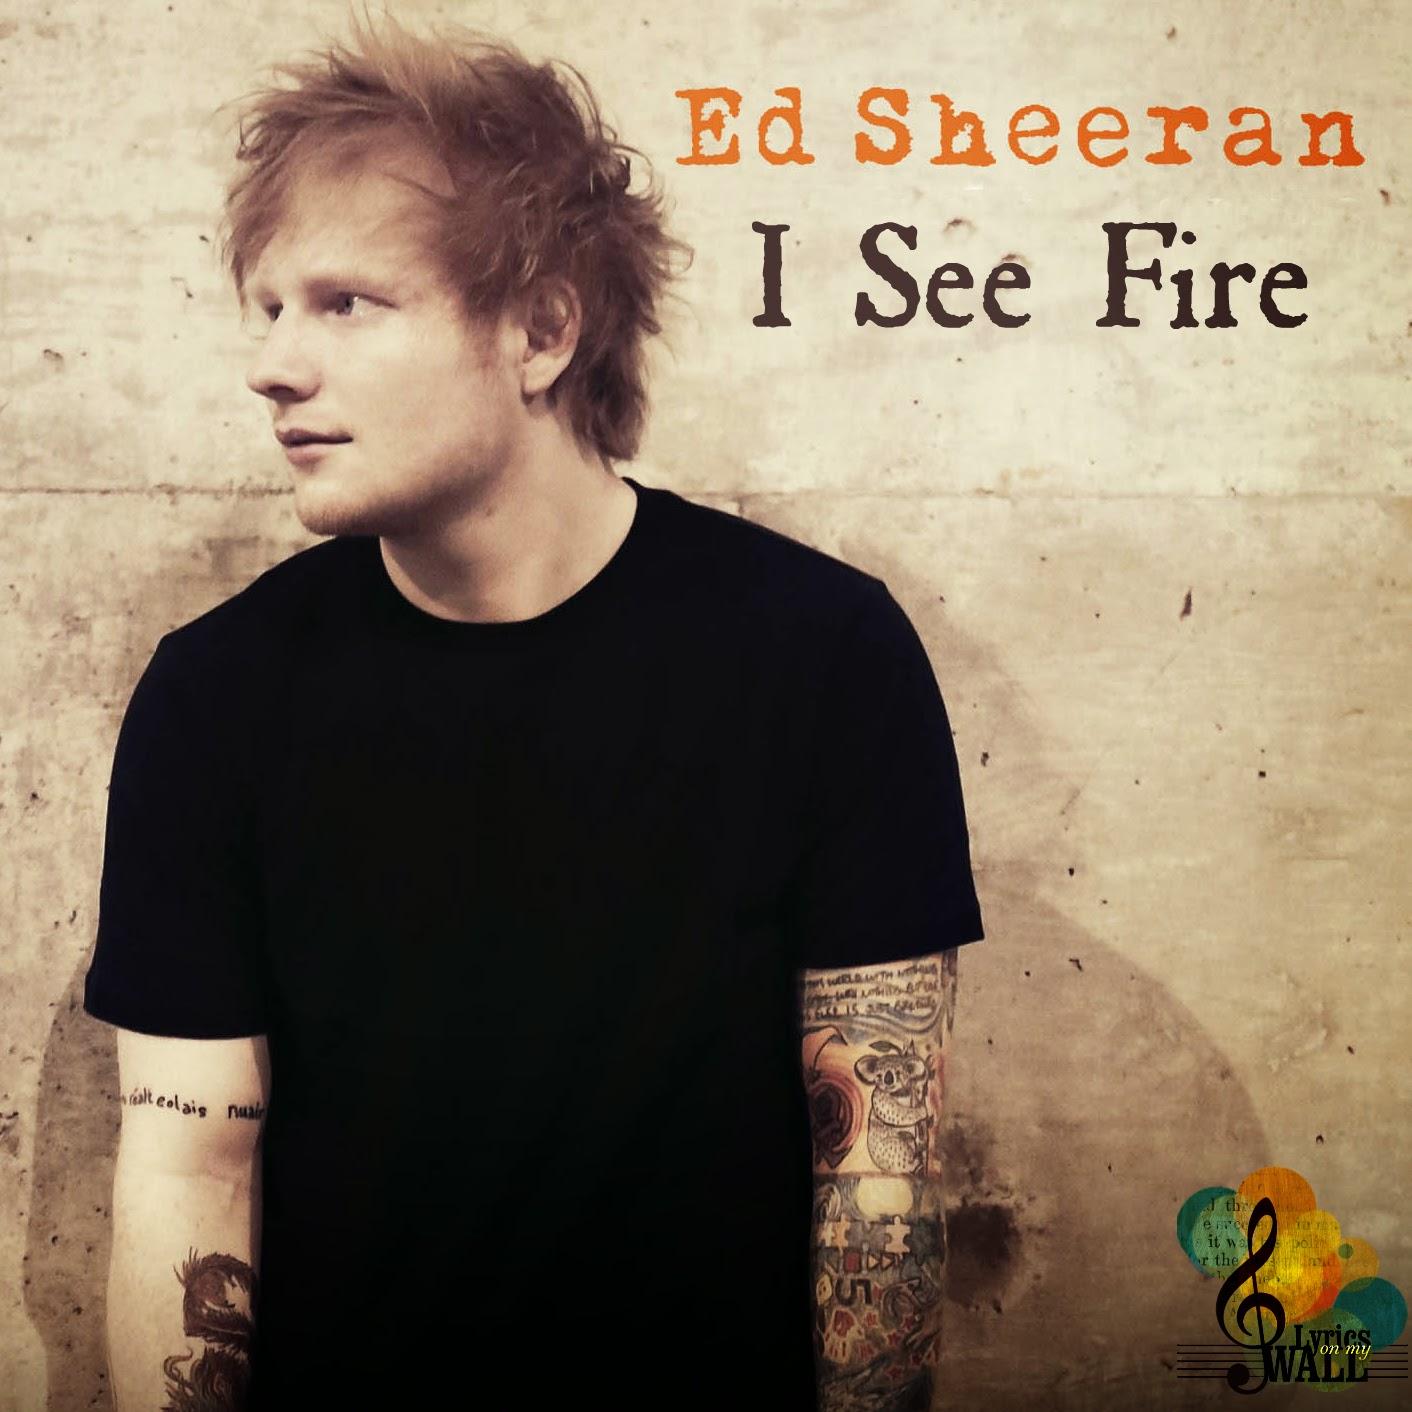 Ed Sheeran I see fire